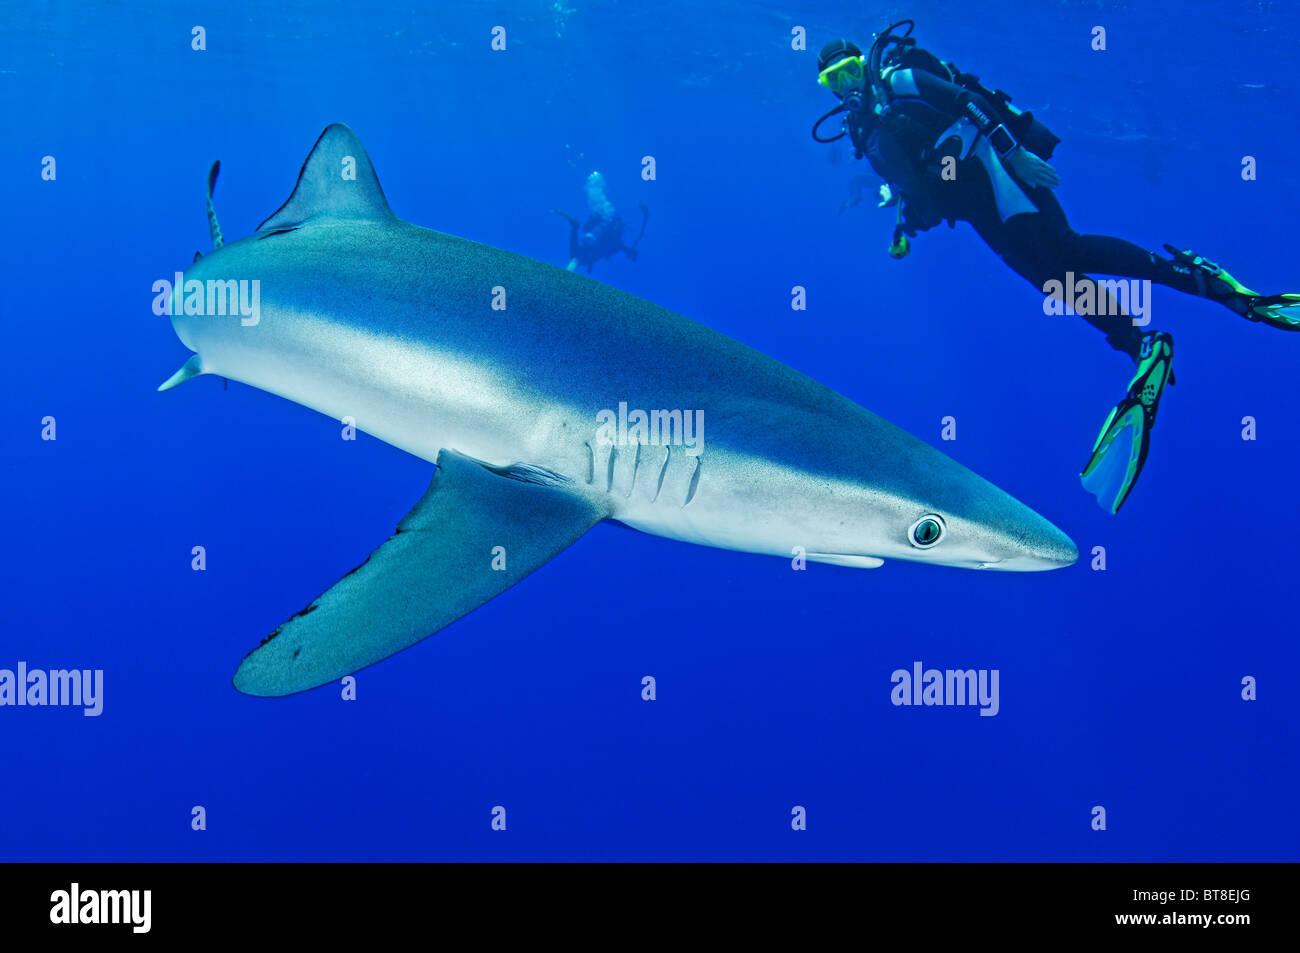 Blue Shark and scuba diver, Prionace glauca, Azores, Portugal, Atlantic Ocean Stock Photo